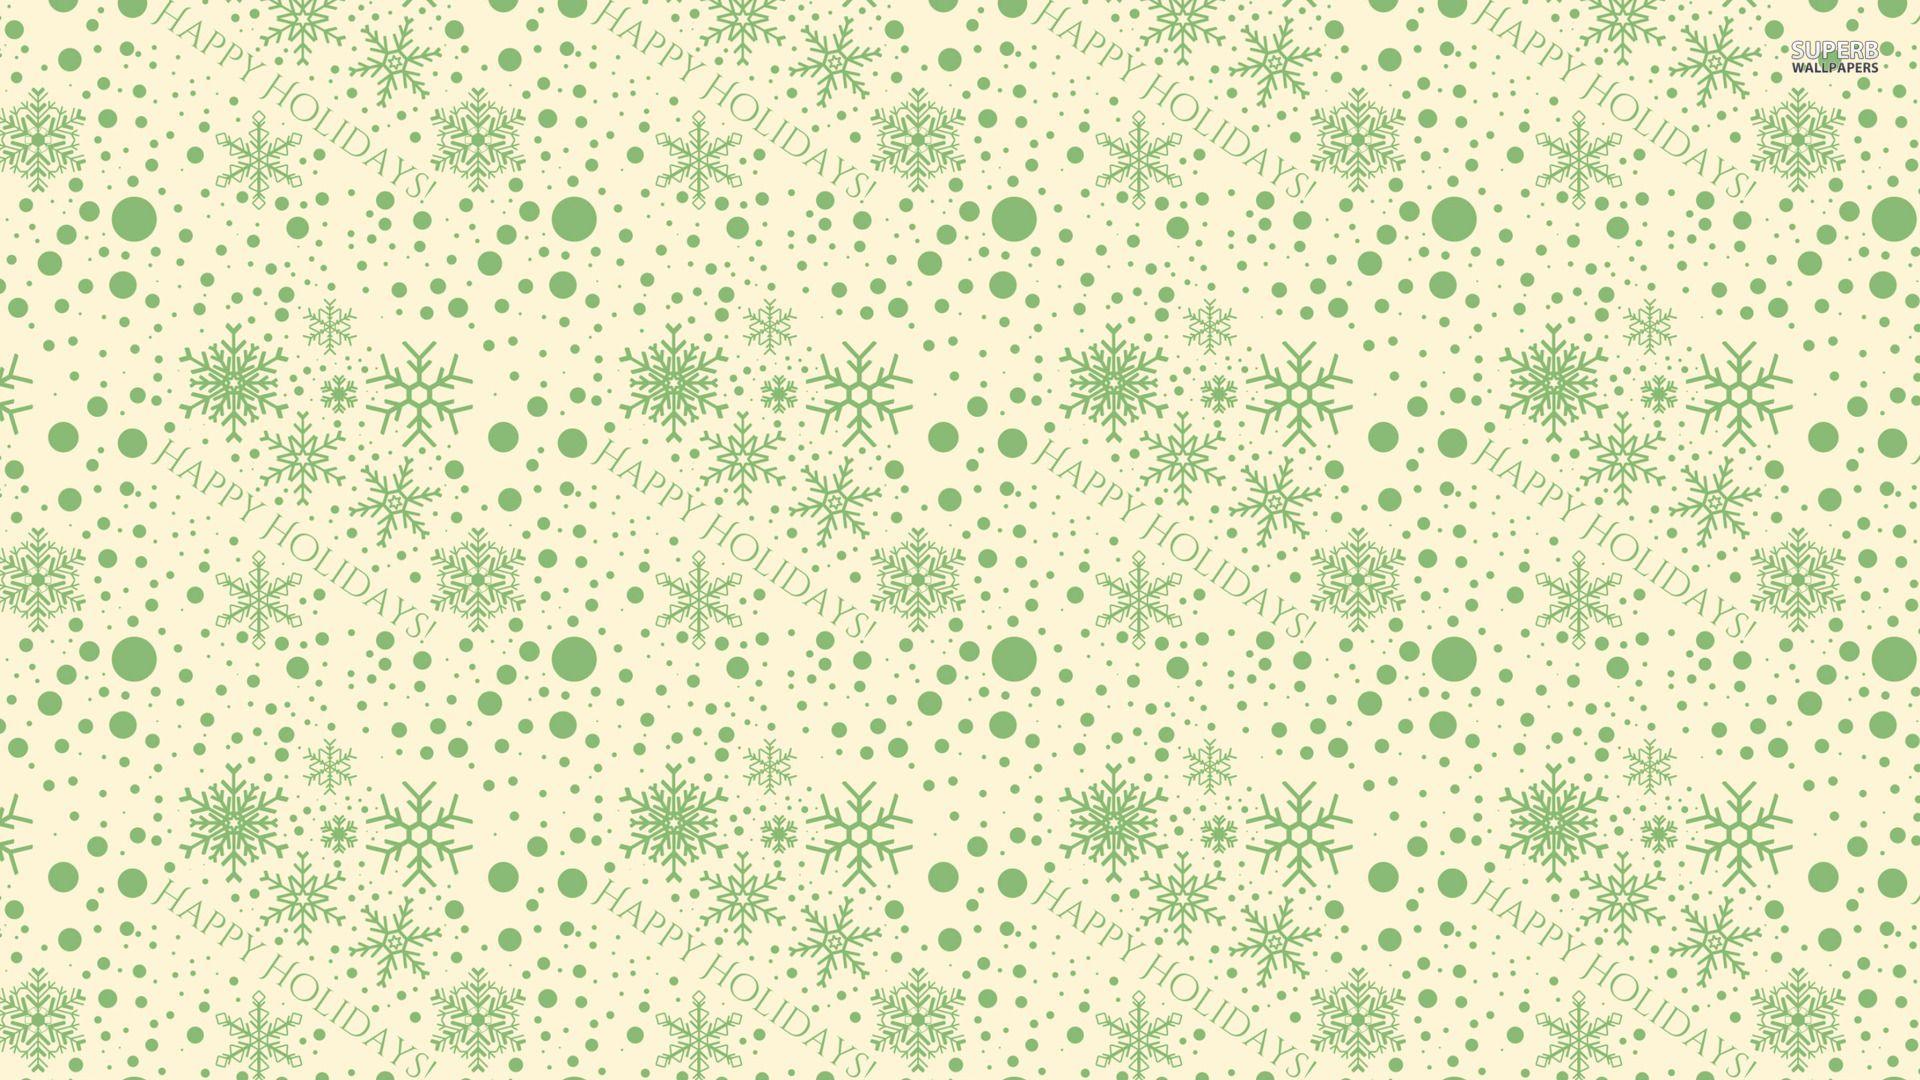 Christmas Scrapbooking background wallpaper